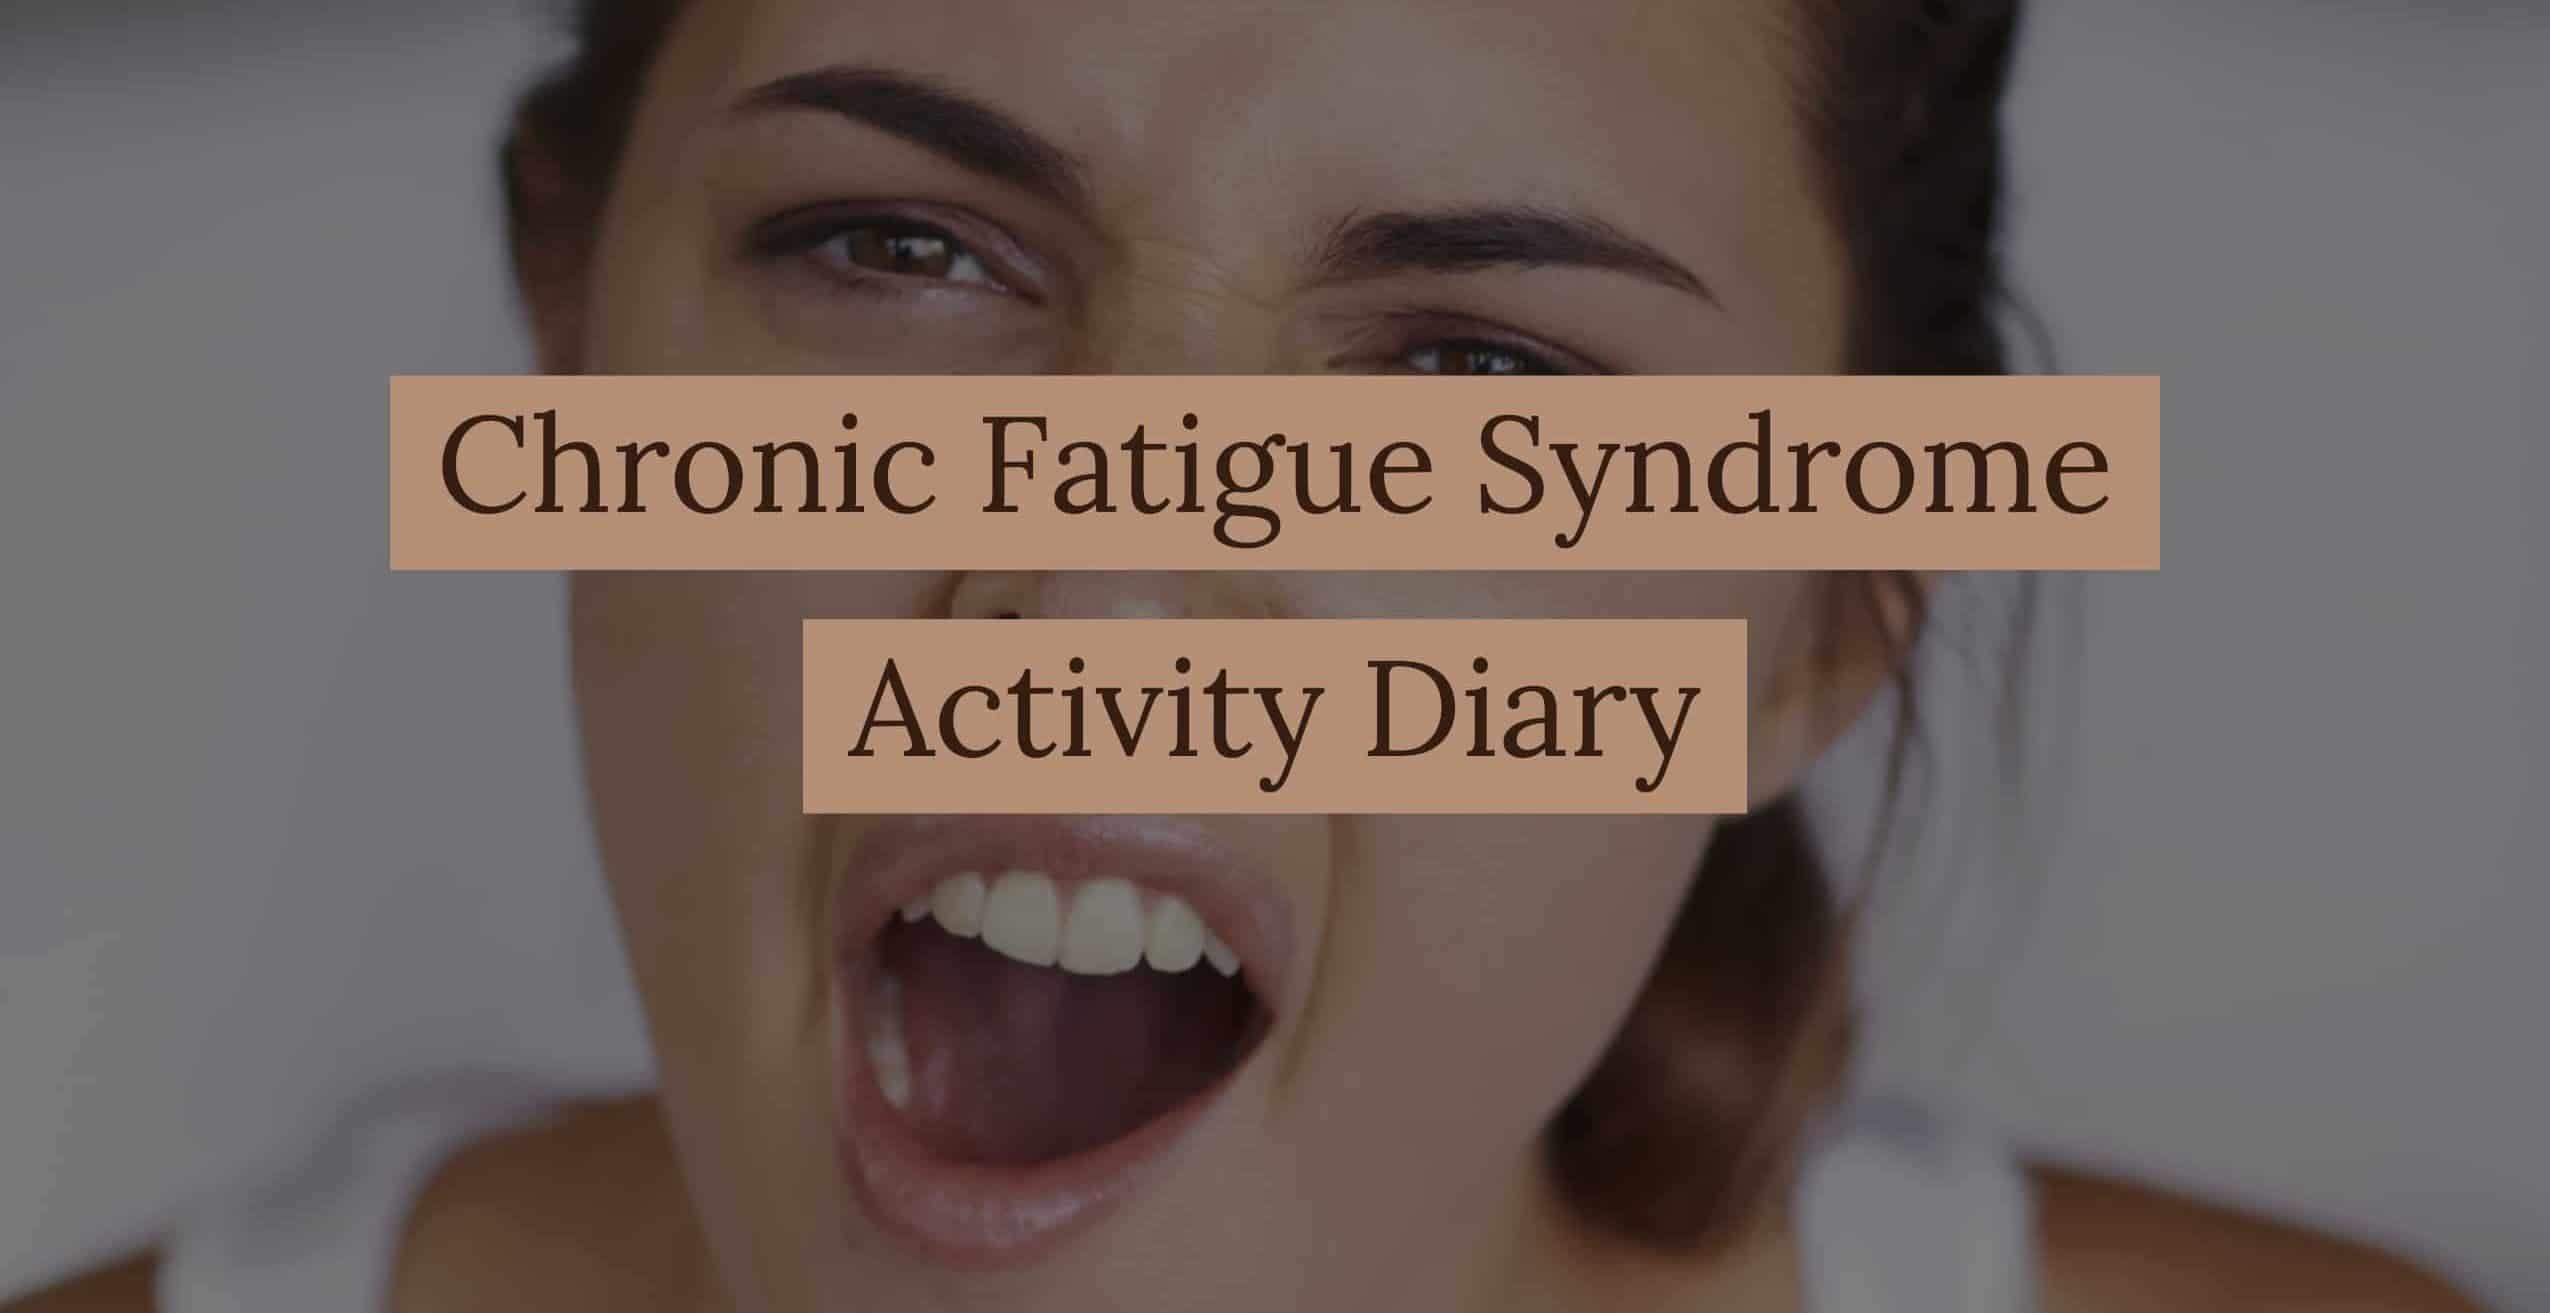 CFS Activity Diary